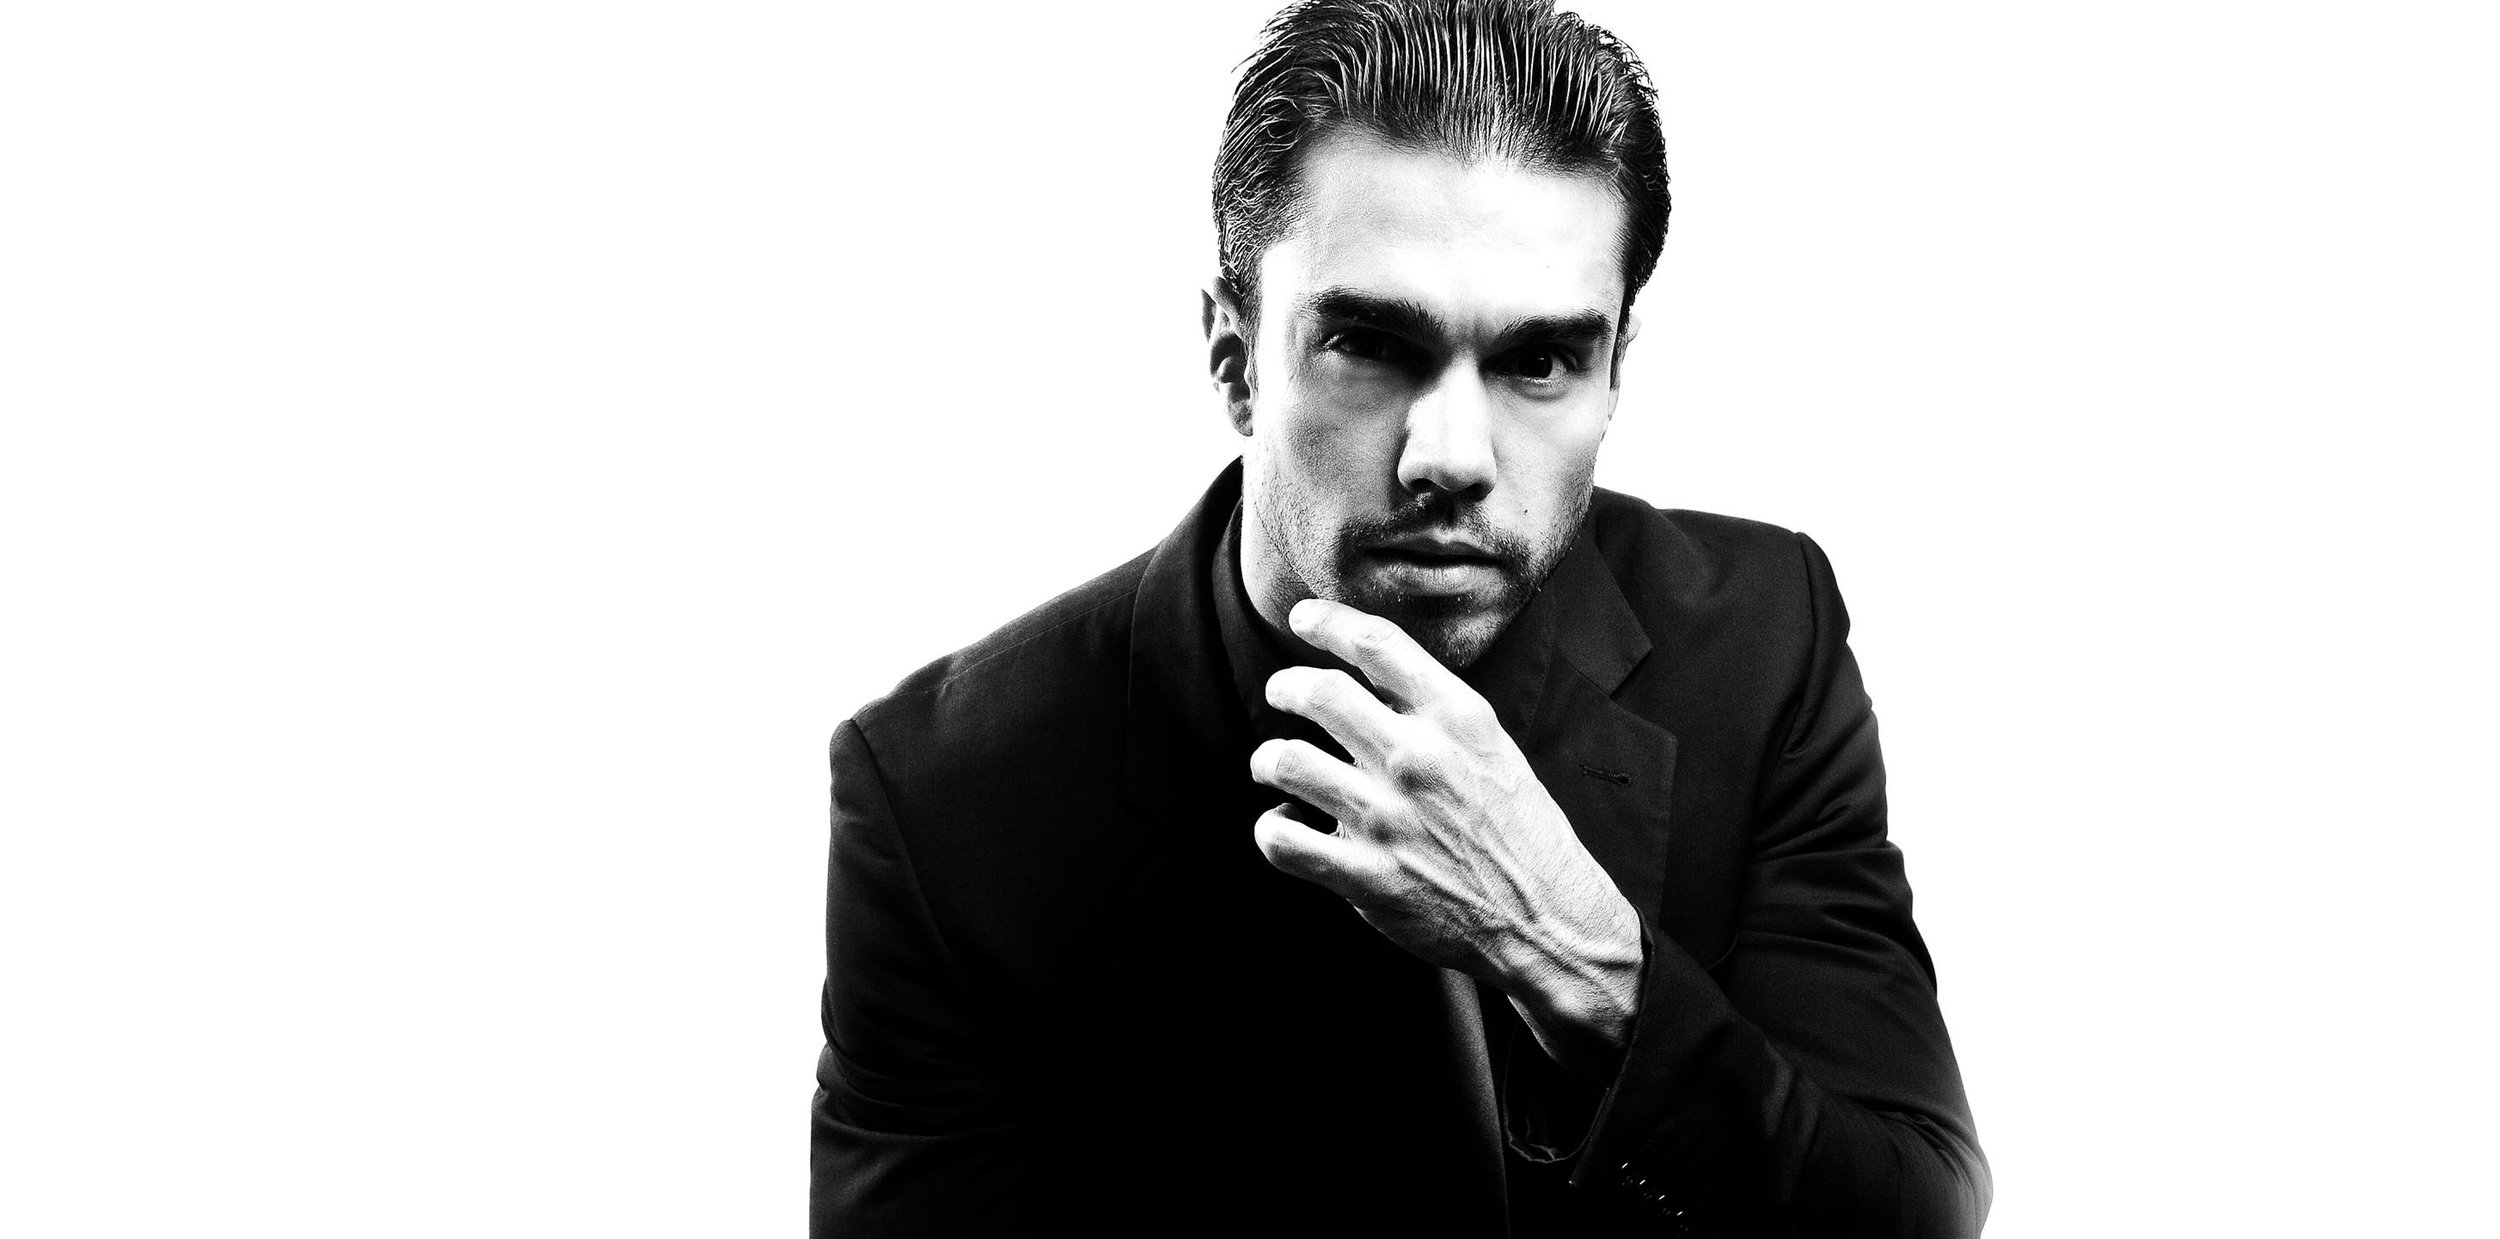 black and white-Jorge Luna.jpg